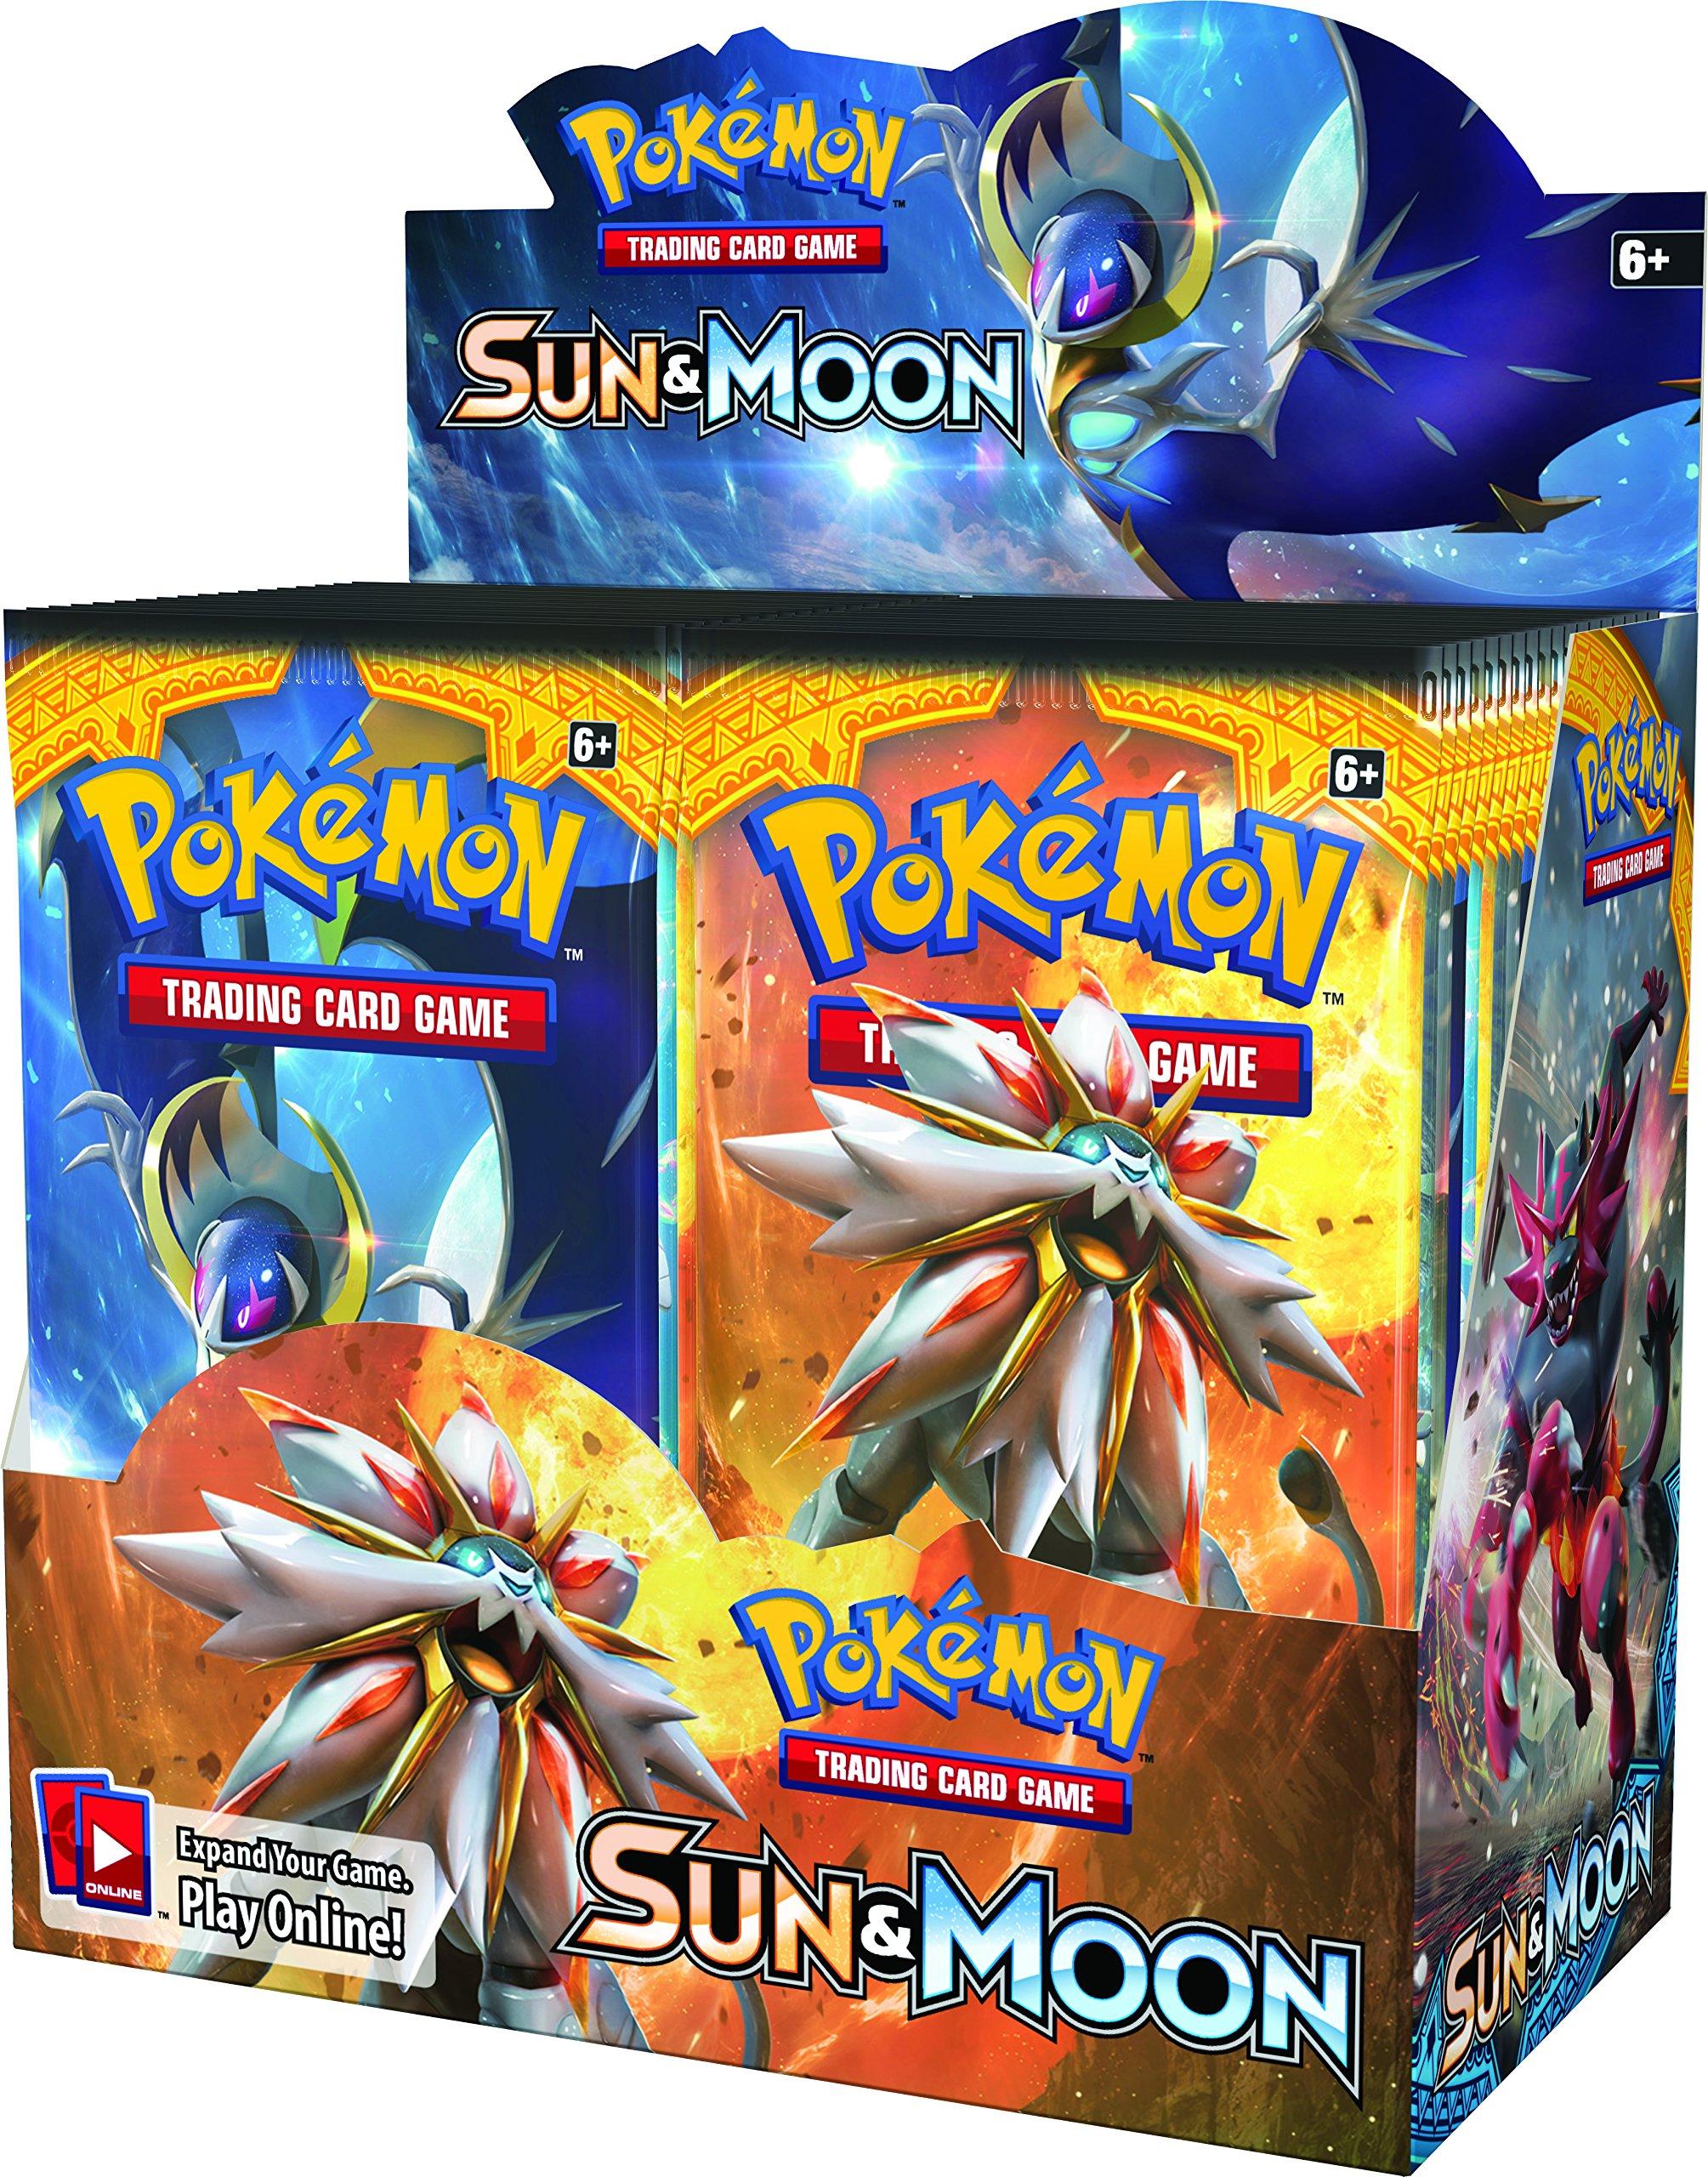 Pokémon TCG: Sun & Moon Sealed Booster Box